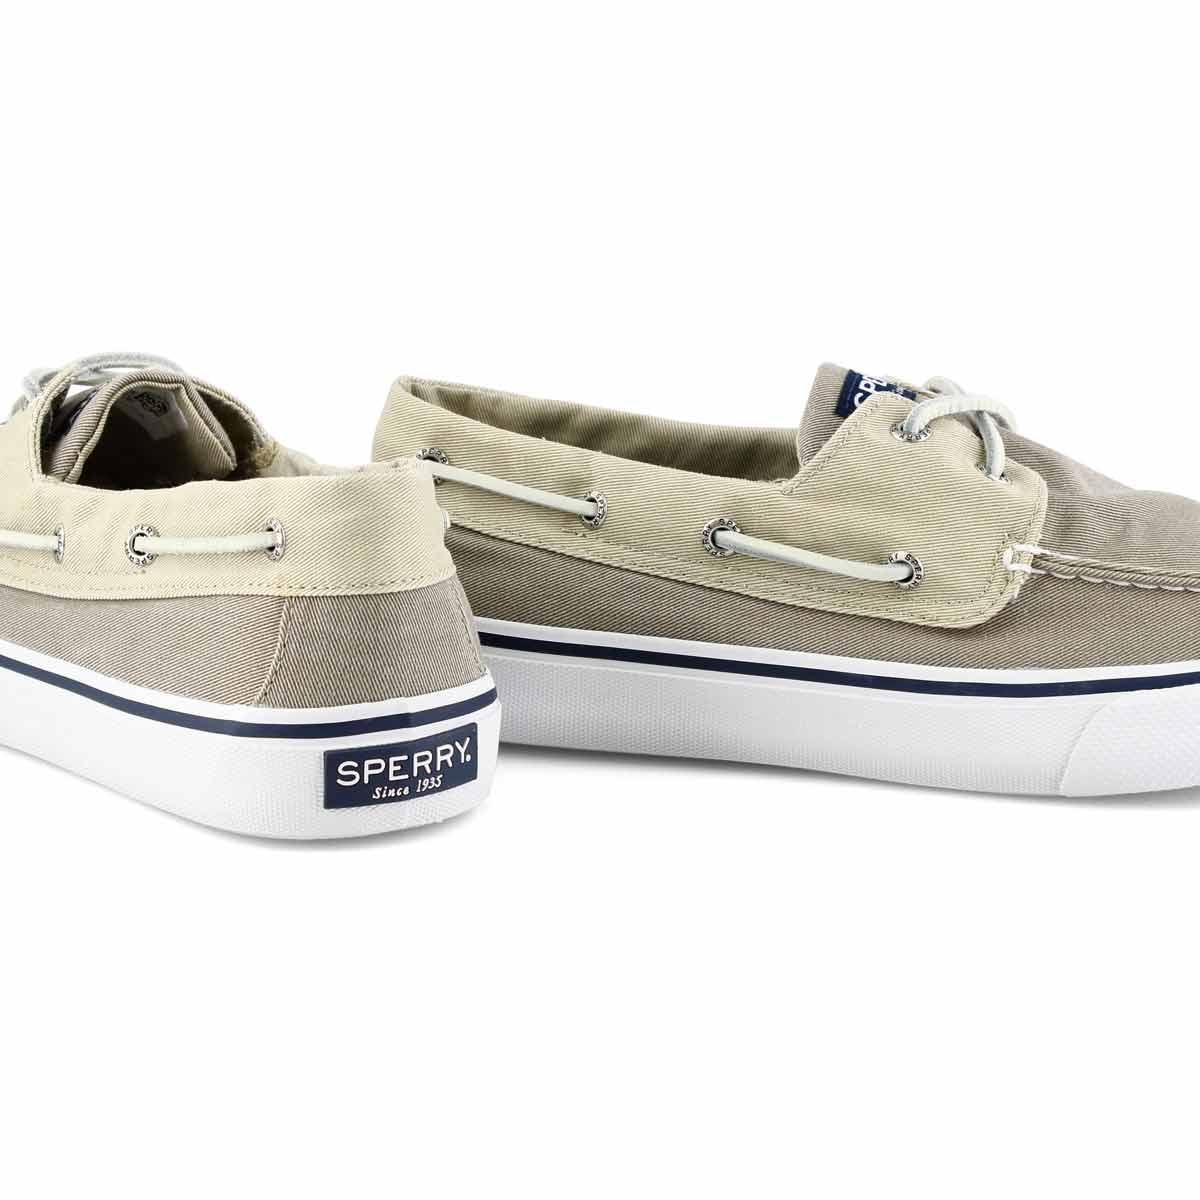 Chaussure bateau, BAHAMA II gris/khaki hommes